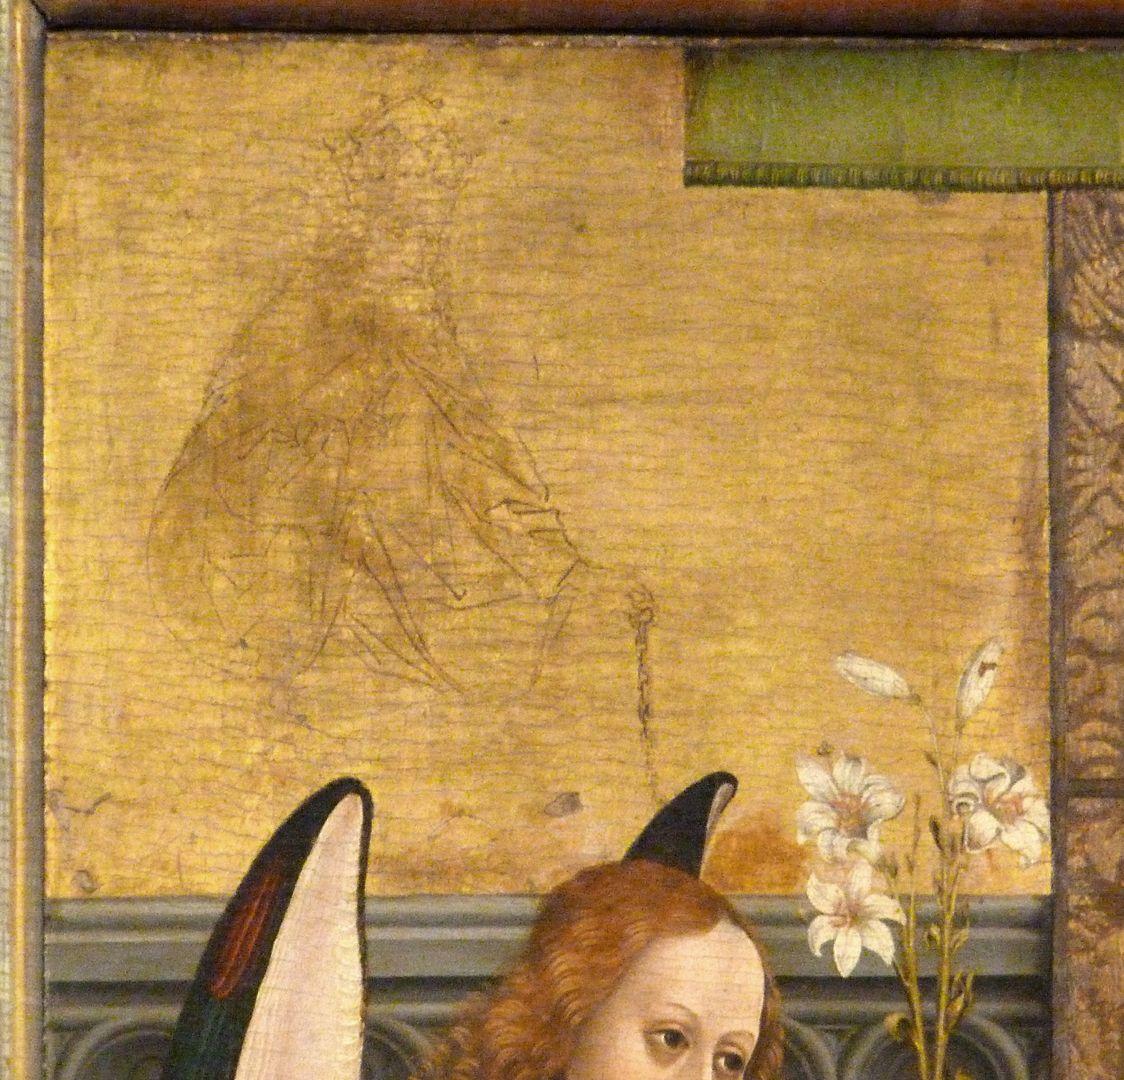 Dreikönigsaltar linker Seitenflügel, oben: Verkündigung, obere linke Ecke, Detail mit Gottvater